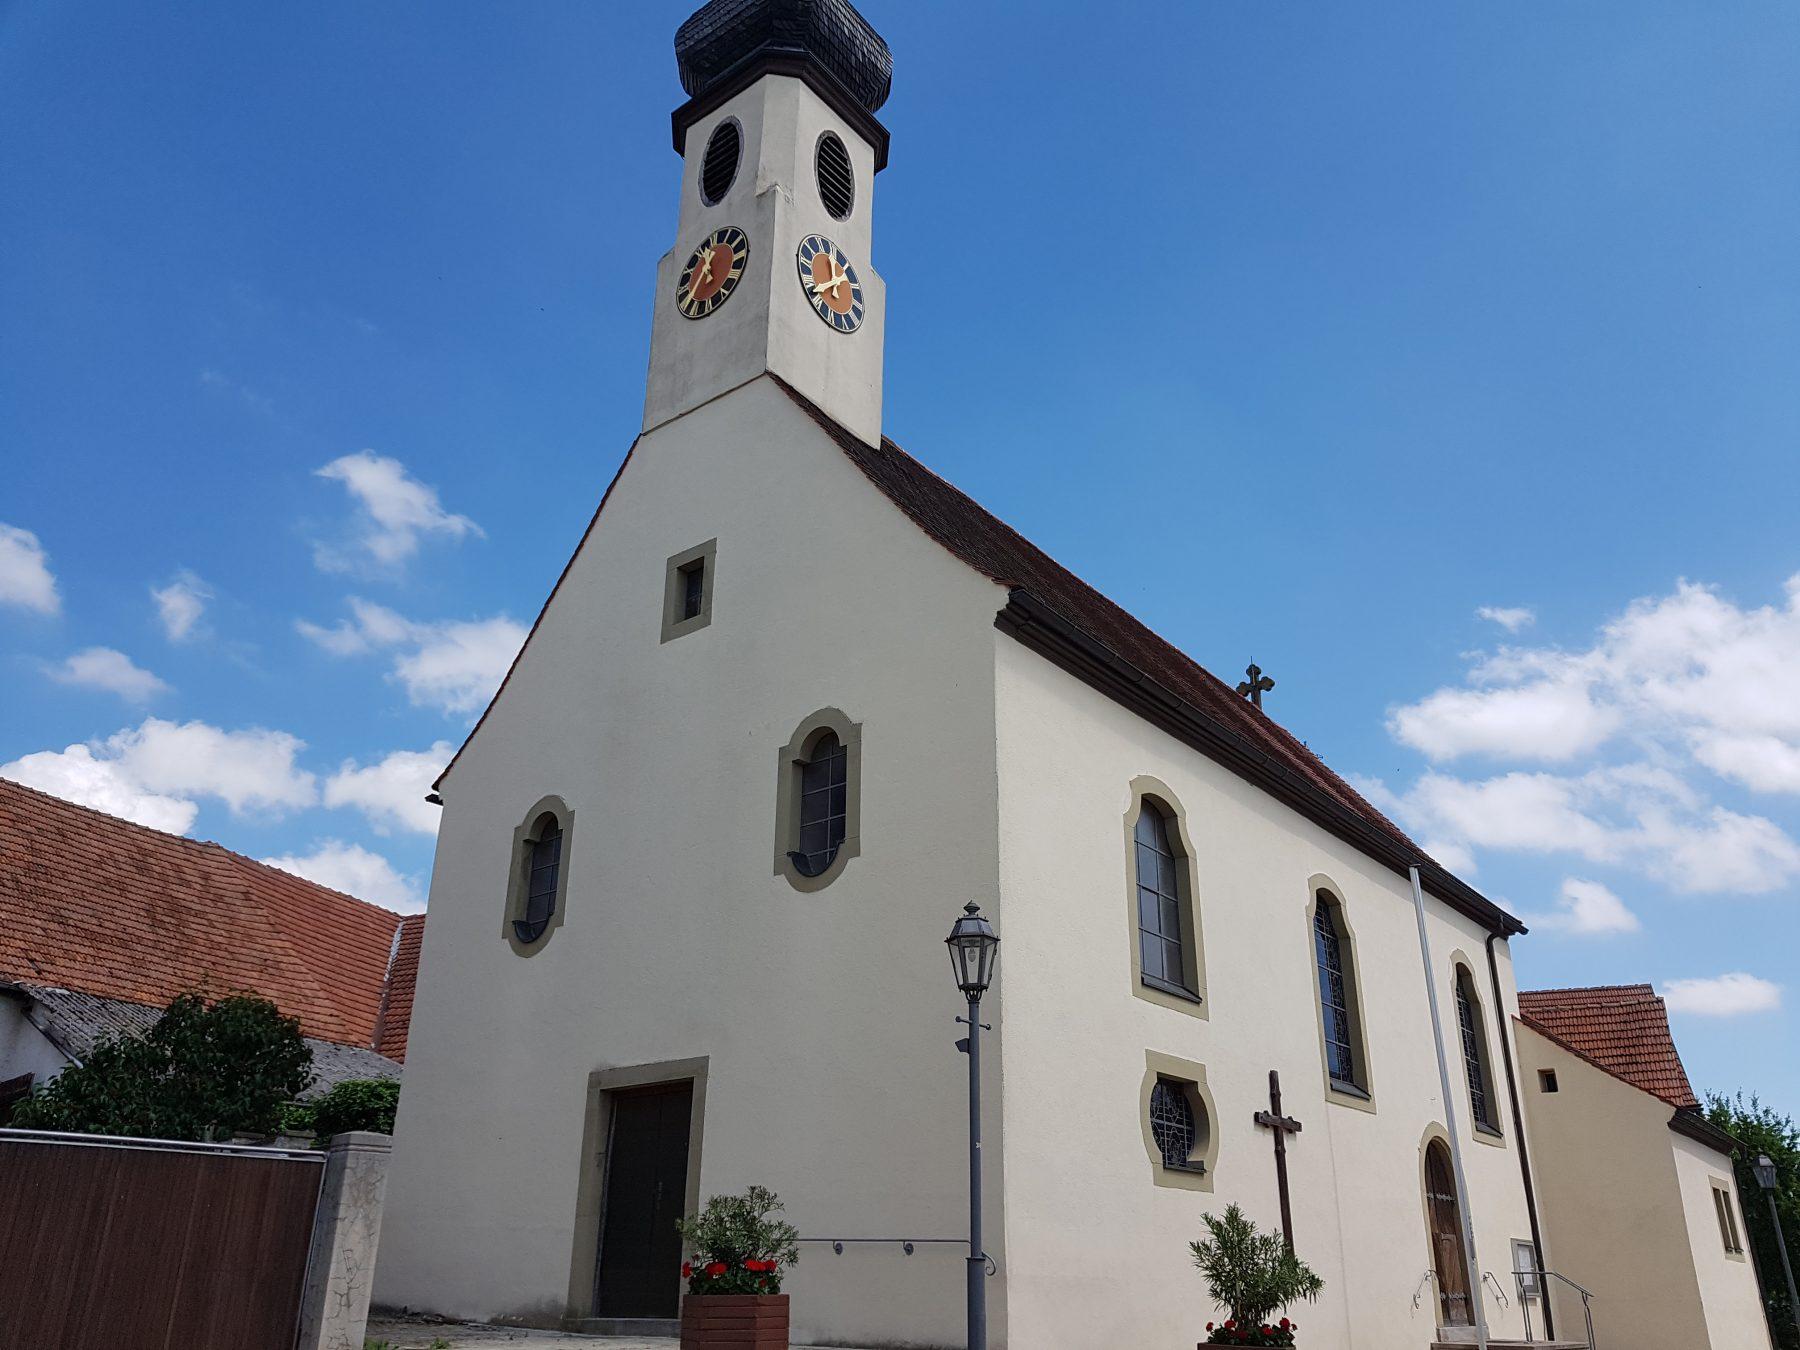 St. Georg Rimbach